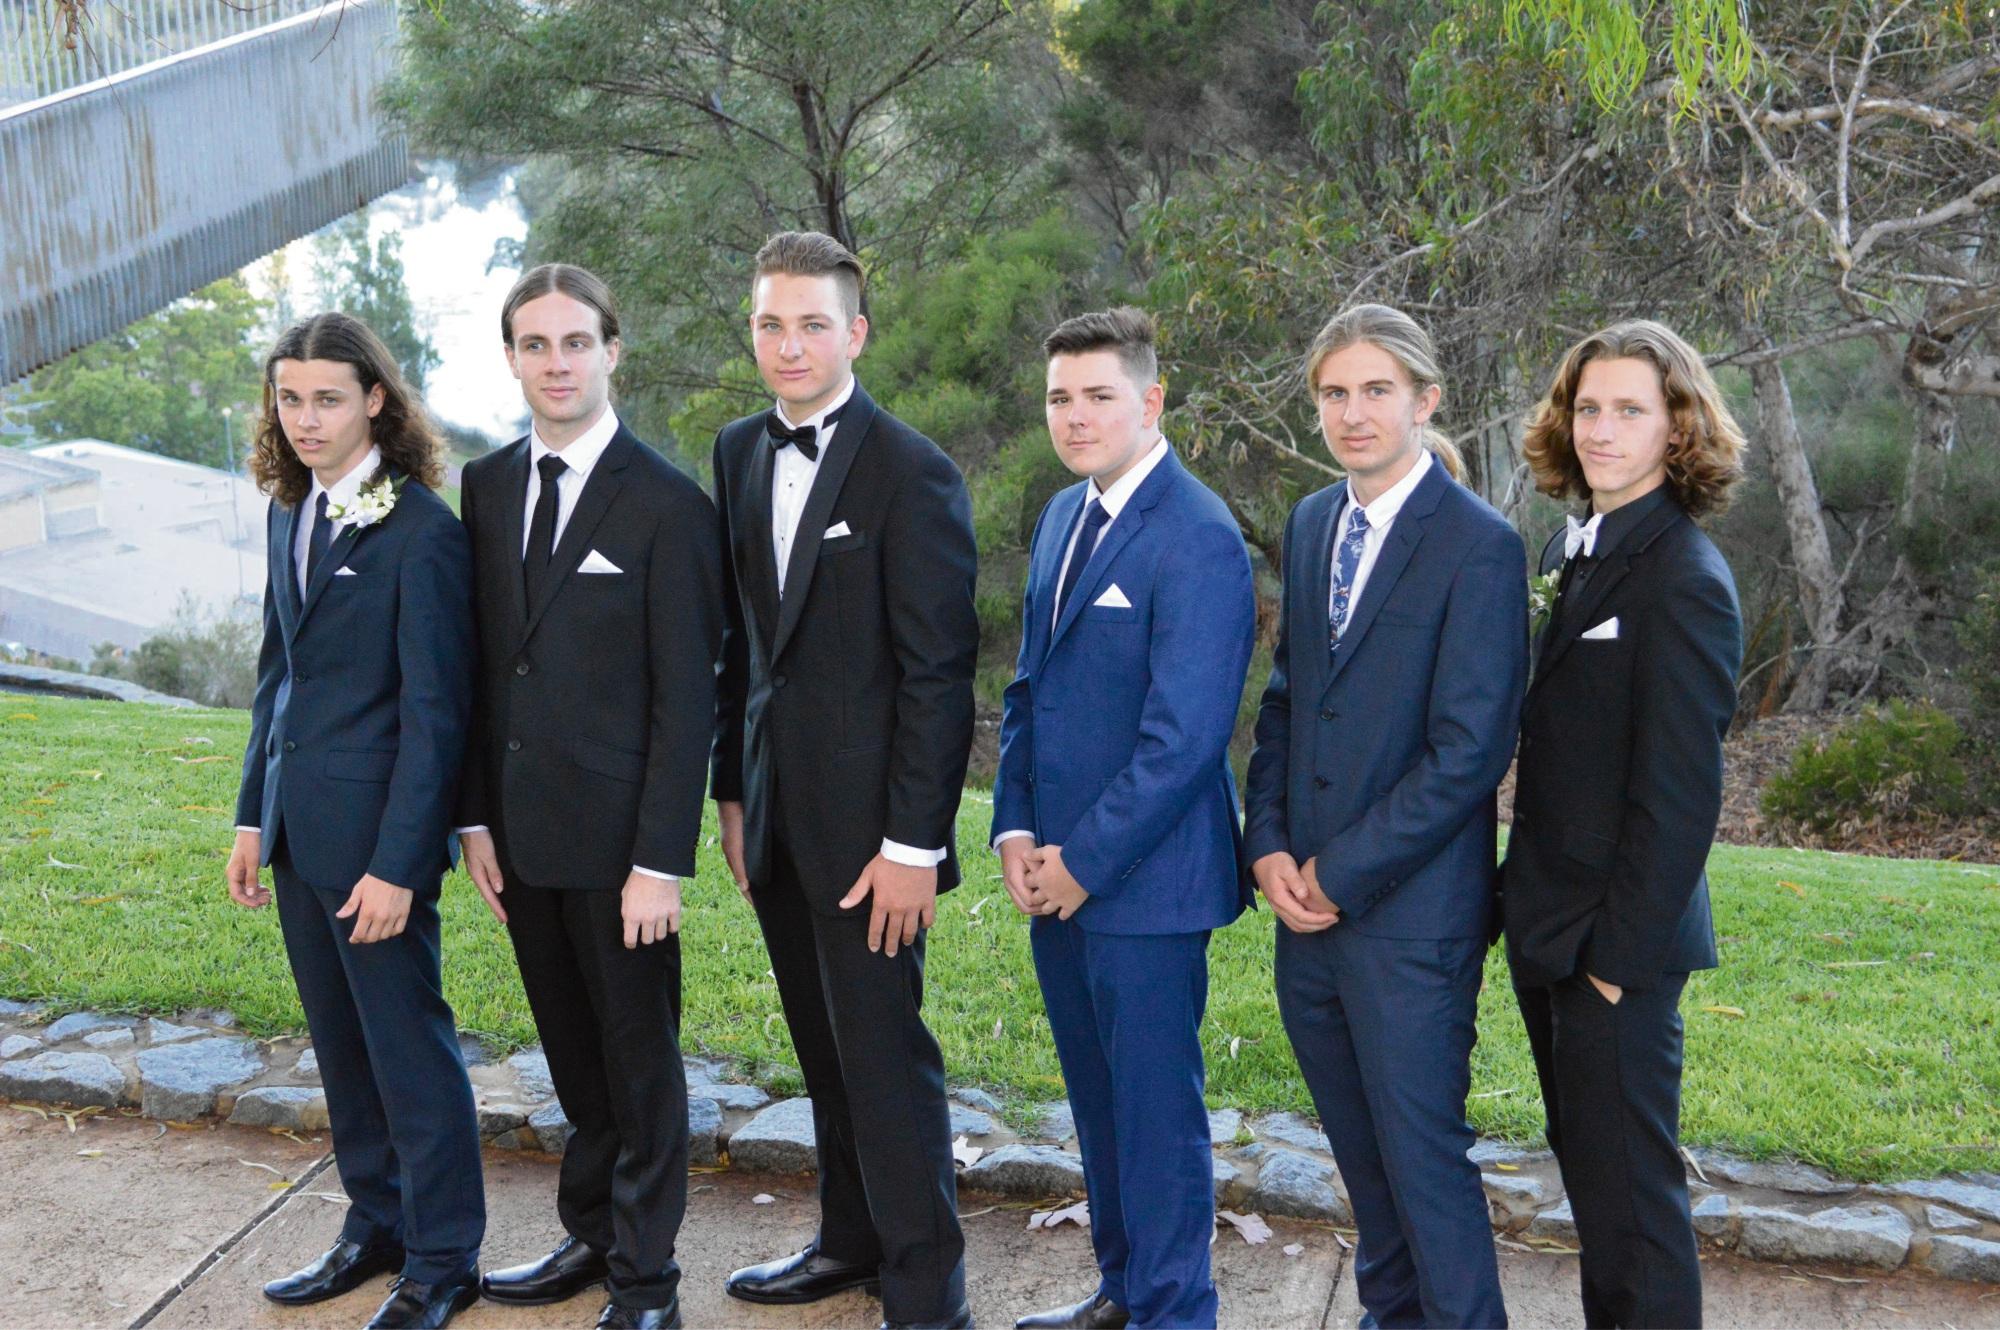 Liam Farmer, Brodie Andrews, Tom Ullrich, Tom McLean, Byron Reid and Noah Clune.